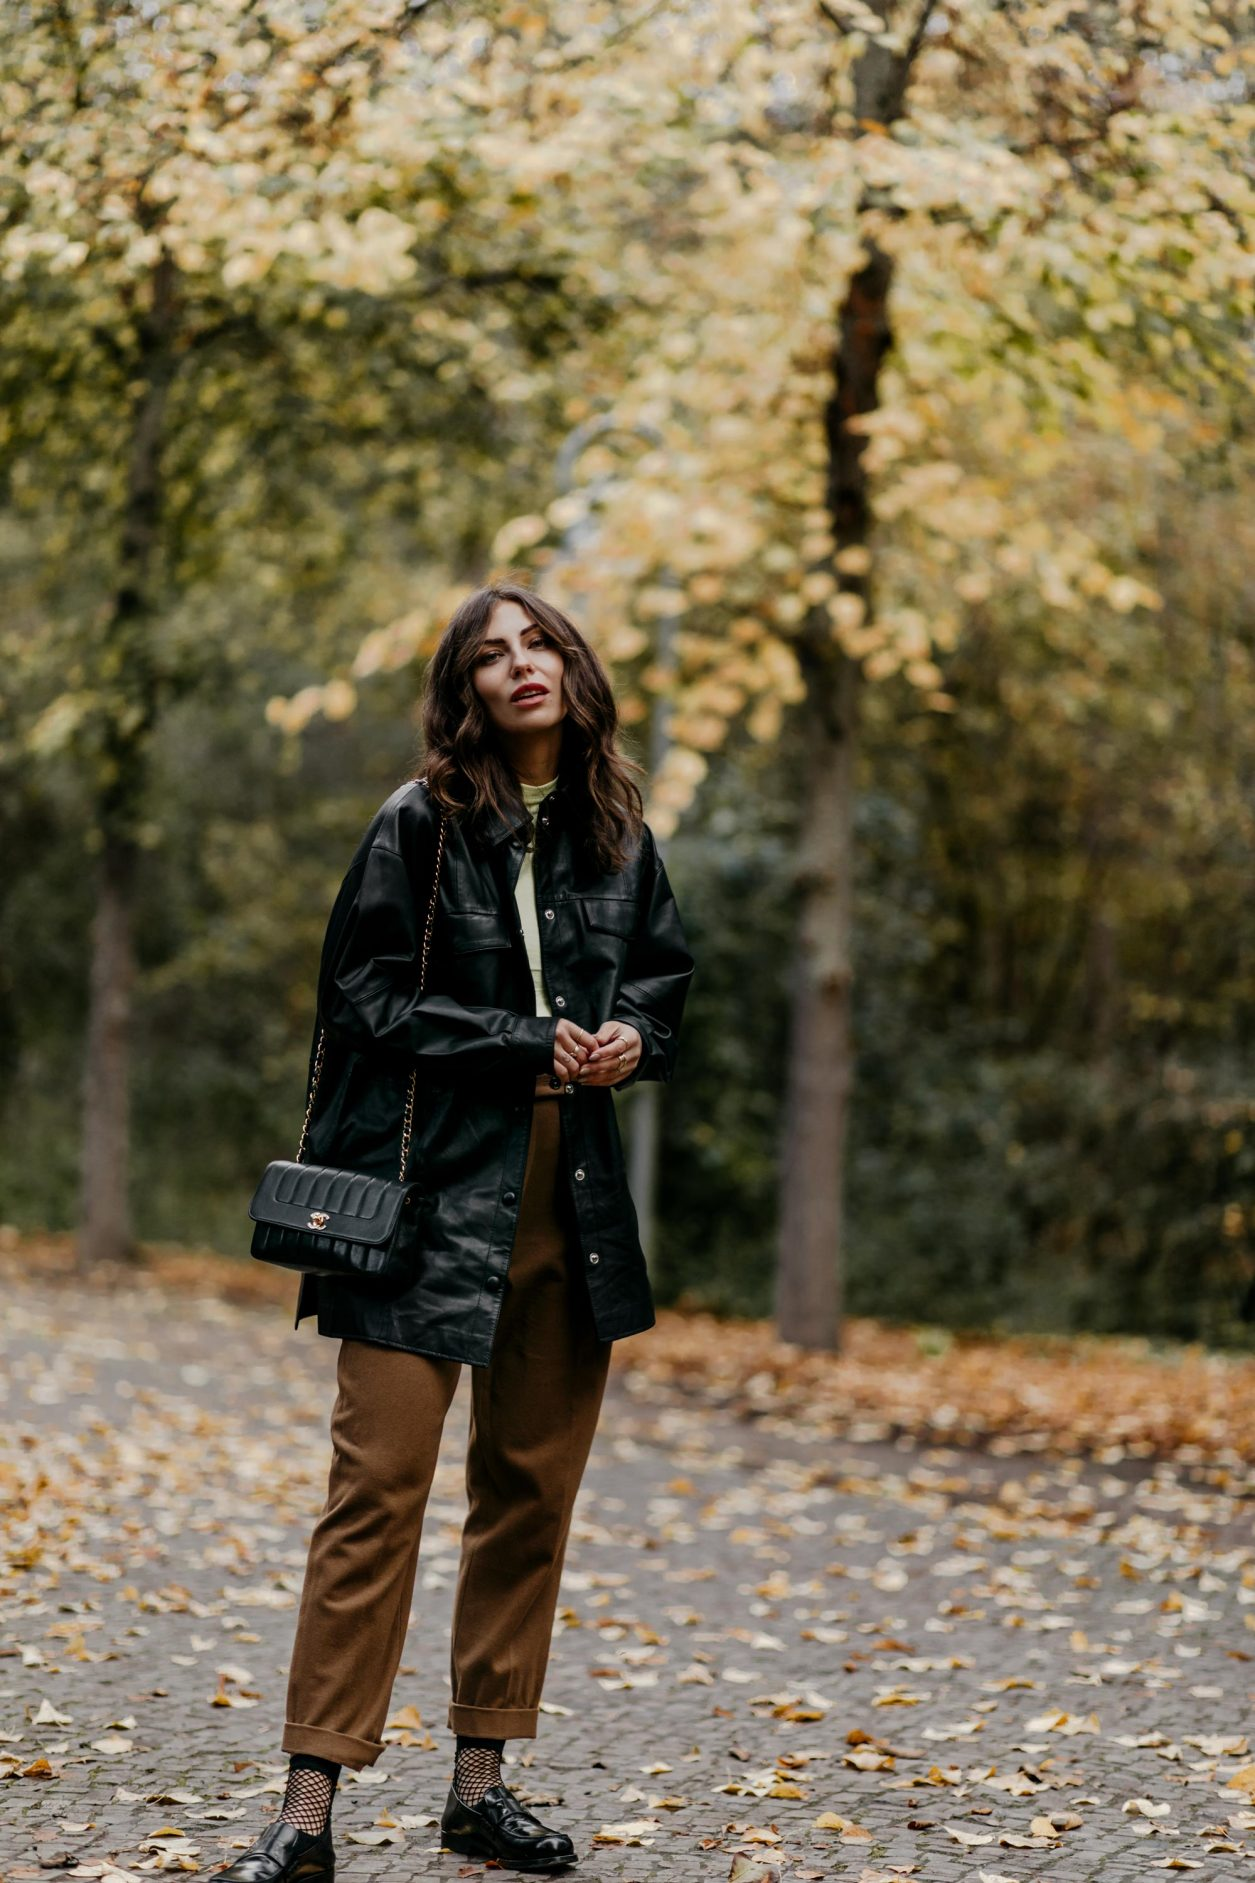 Fashion Blogger Masha Sedgwick | Fall outfit inspiration wearing animal printed zebra Coat: Lala Berlin Rollneck: Set Faux Leather Blouse: Gestuz Pants: Joseph (alt) Loafer: Maison Margiela Streetstyle Photographer Tonya Matyu